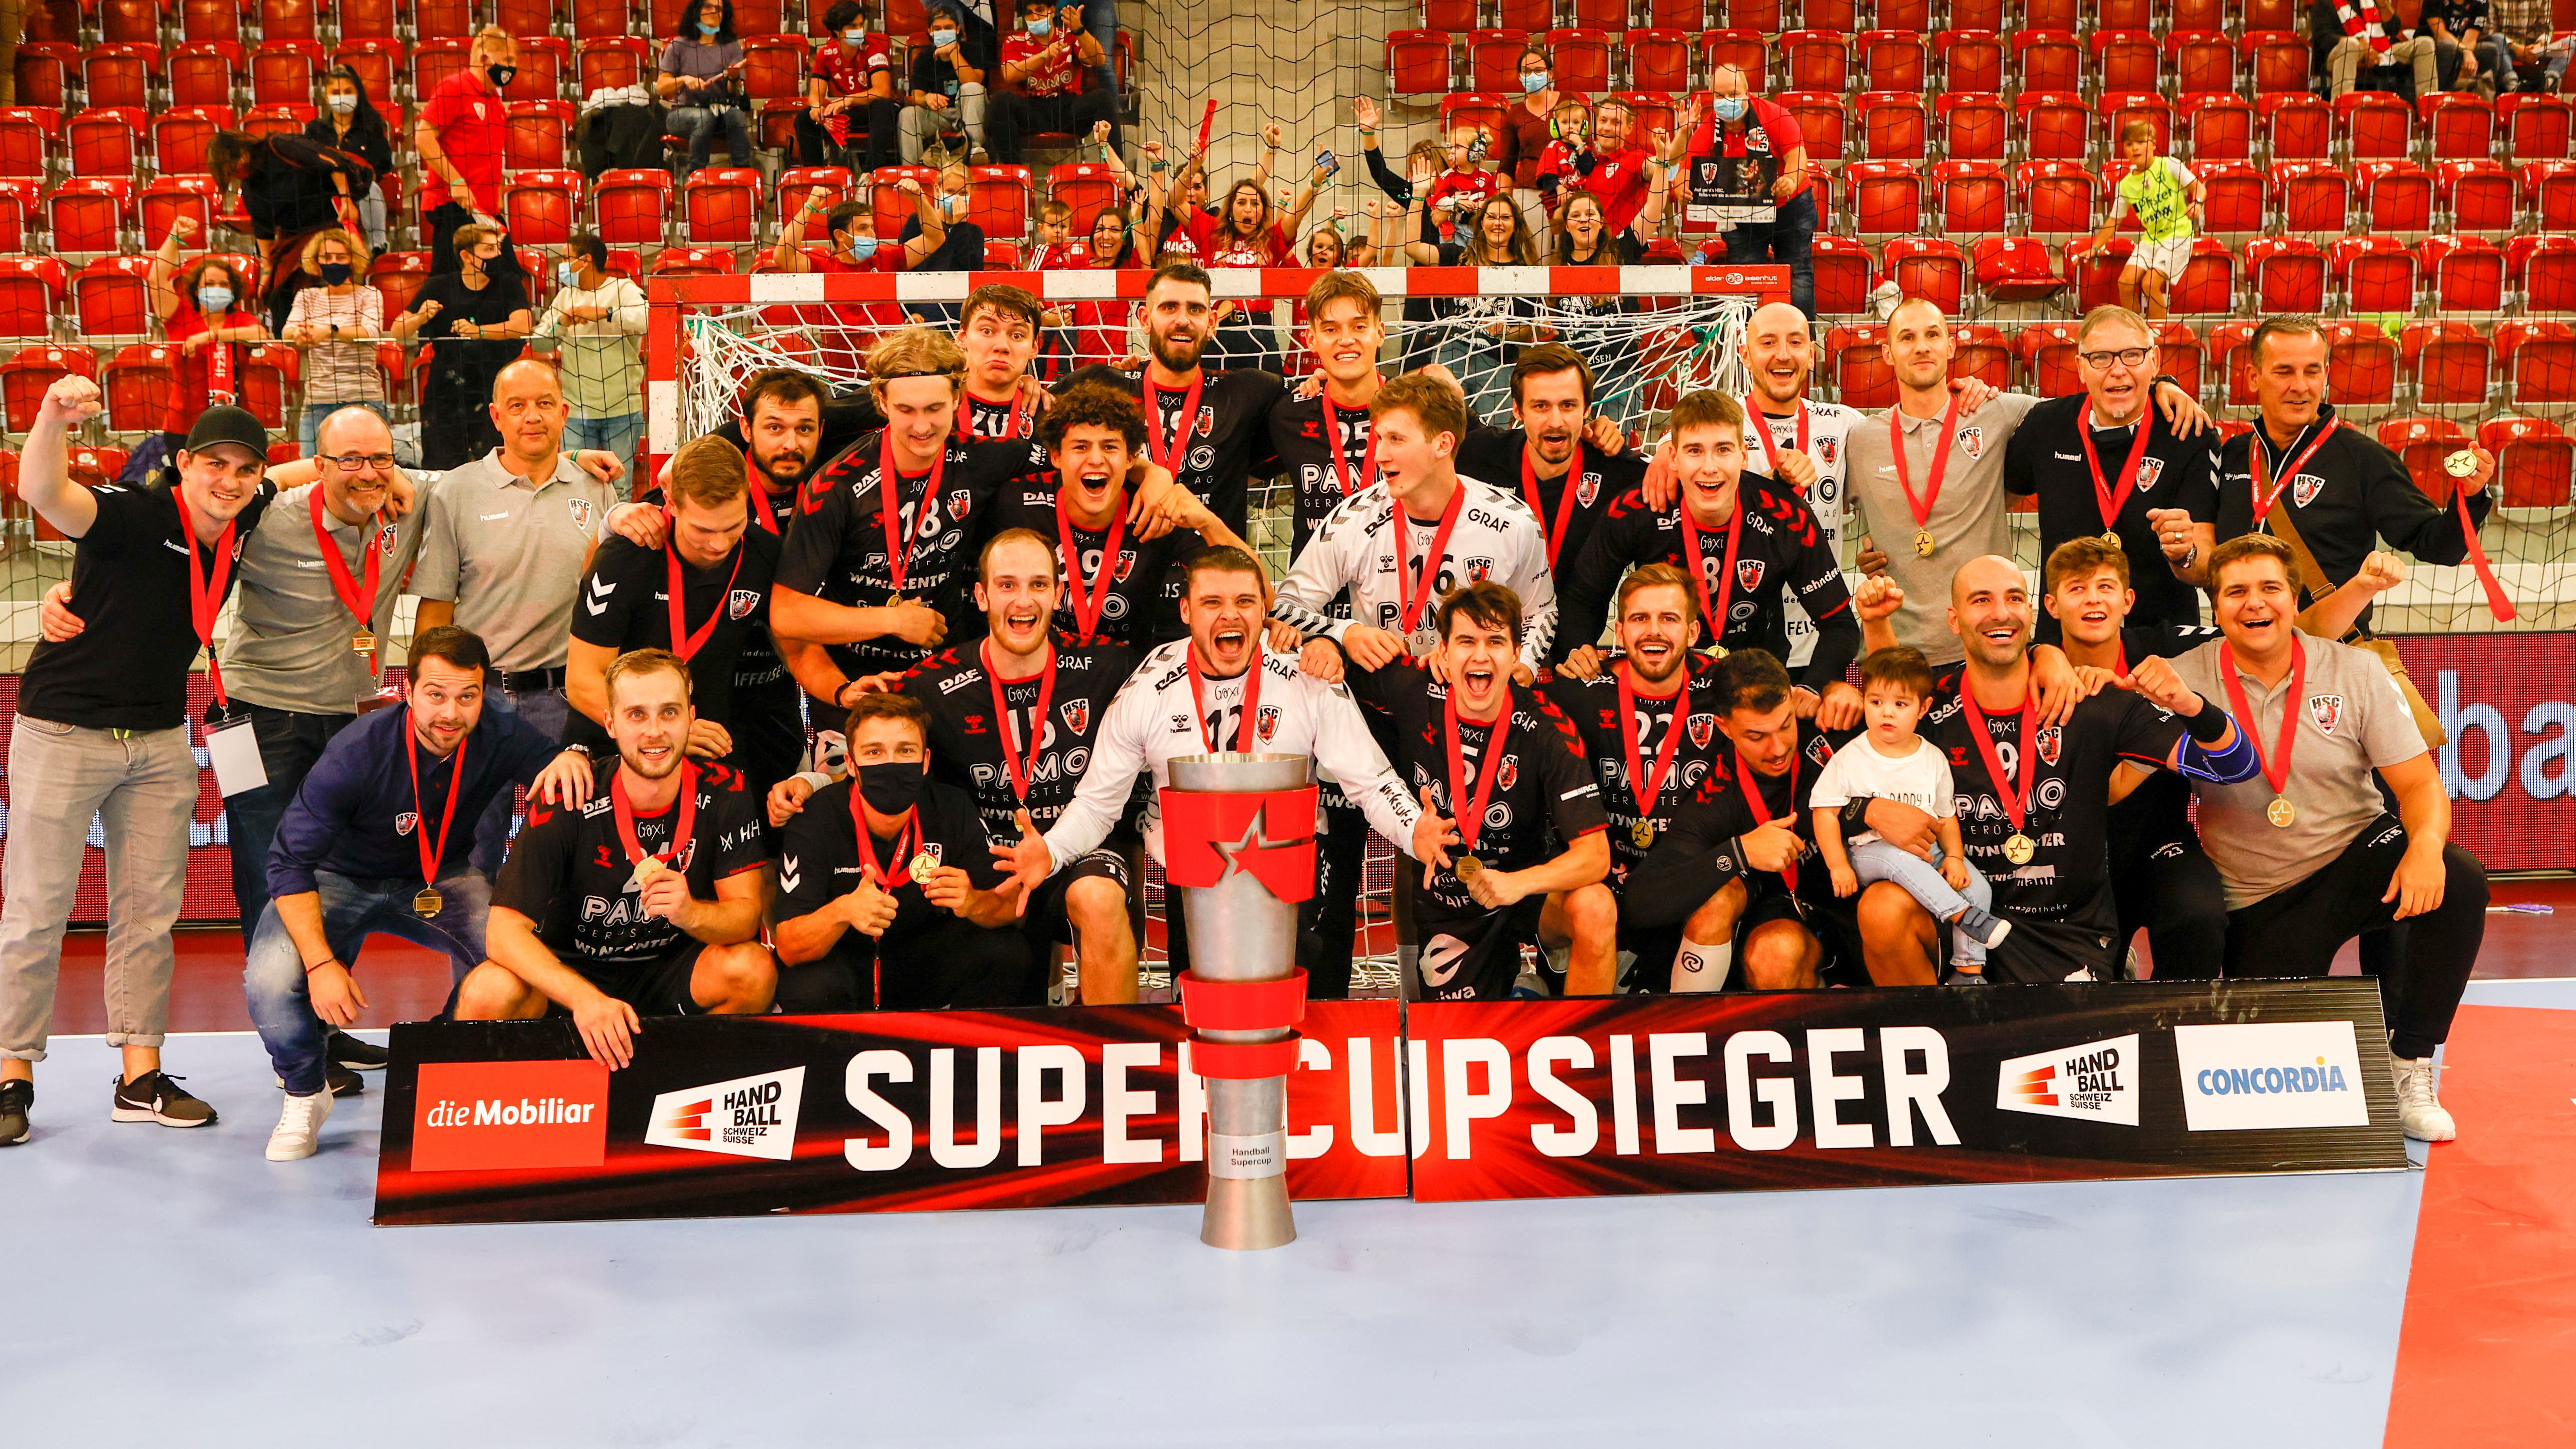 Impressionen vom Handball-Supercup (30. August 2020)